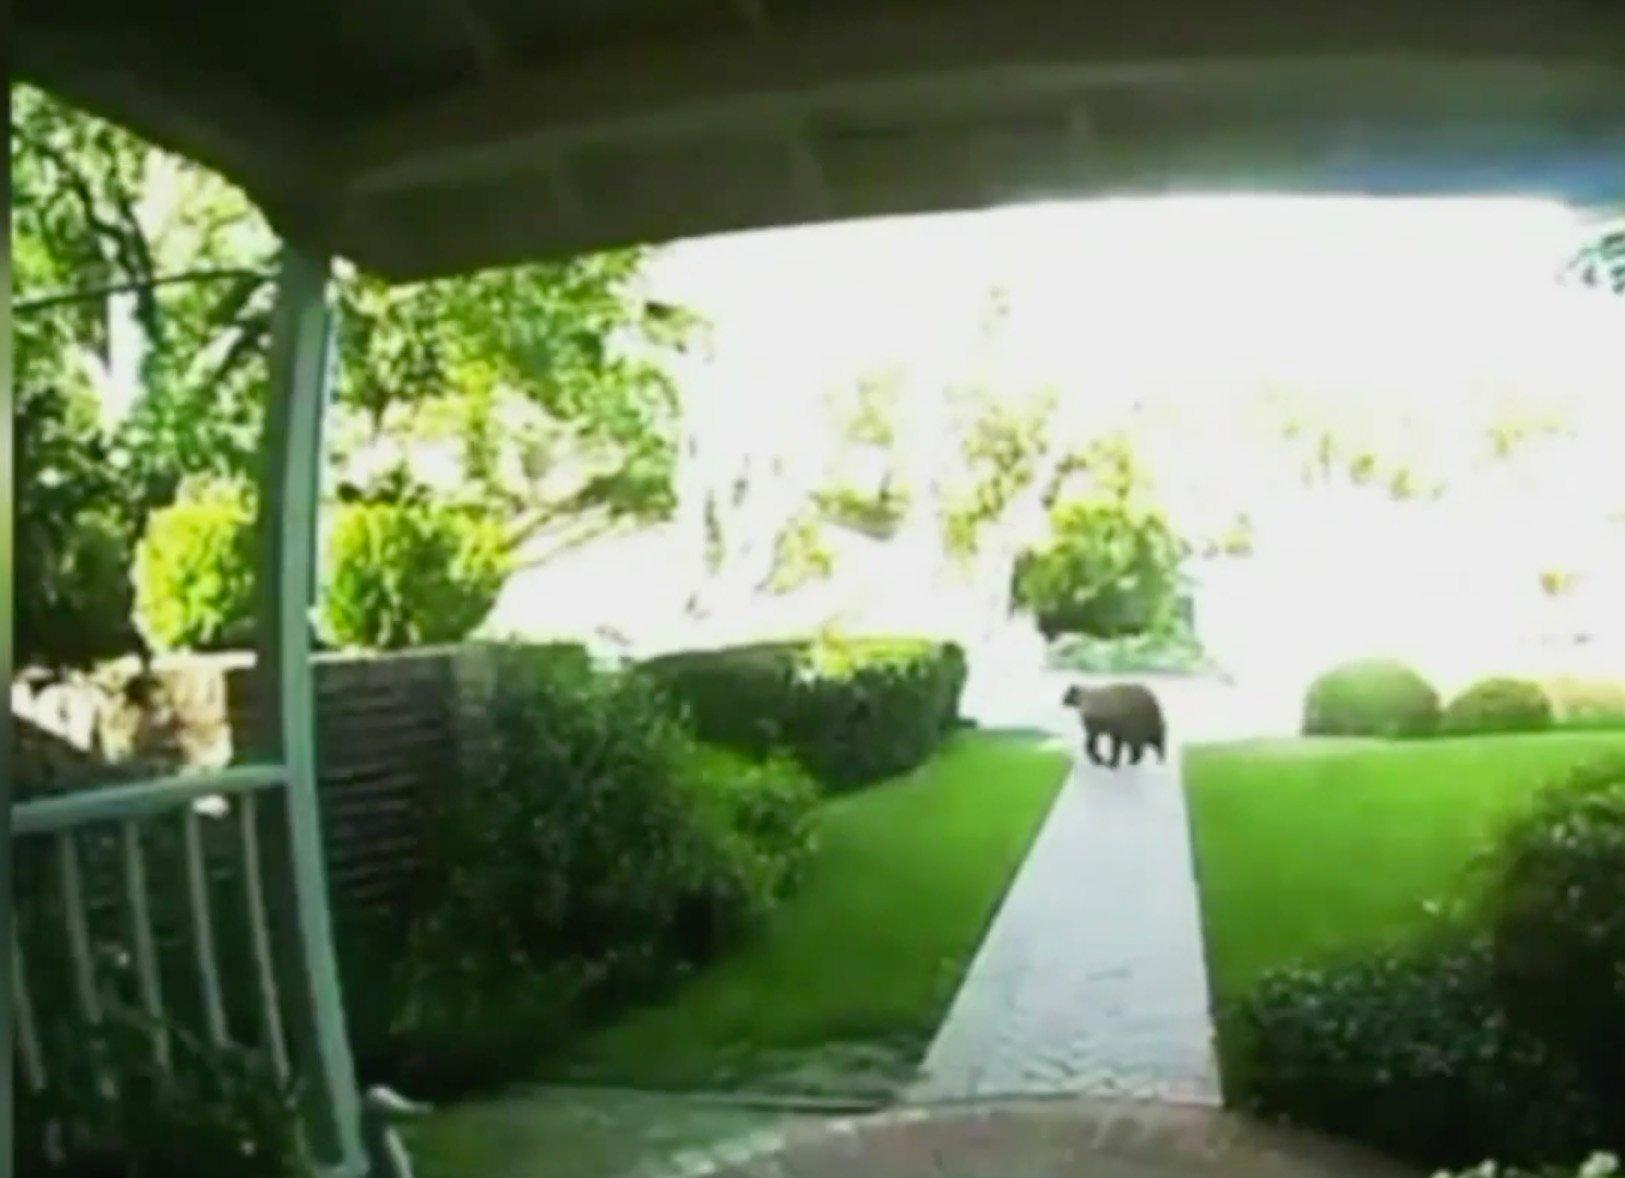 grandma saves toddler from bear